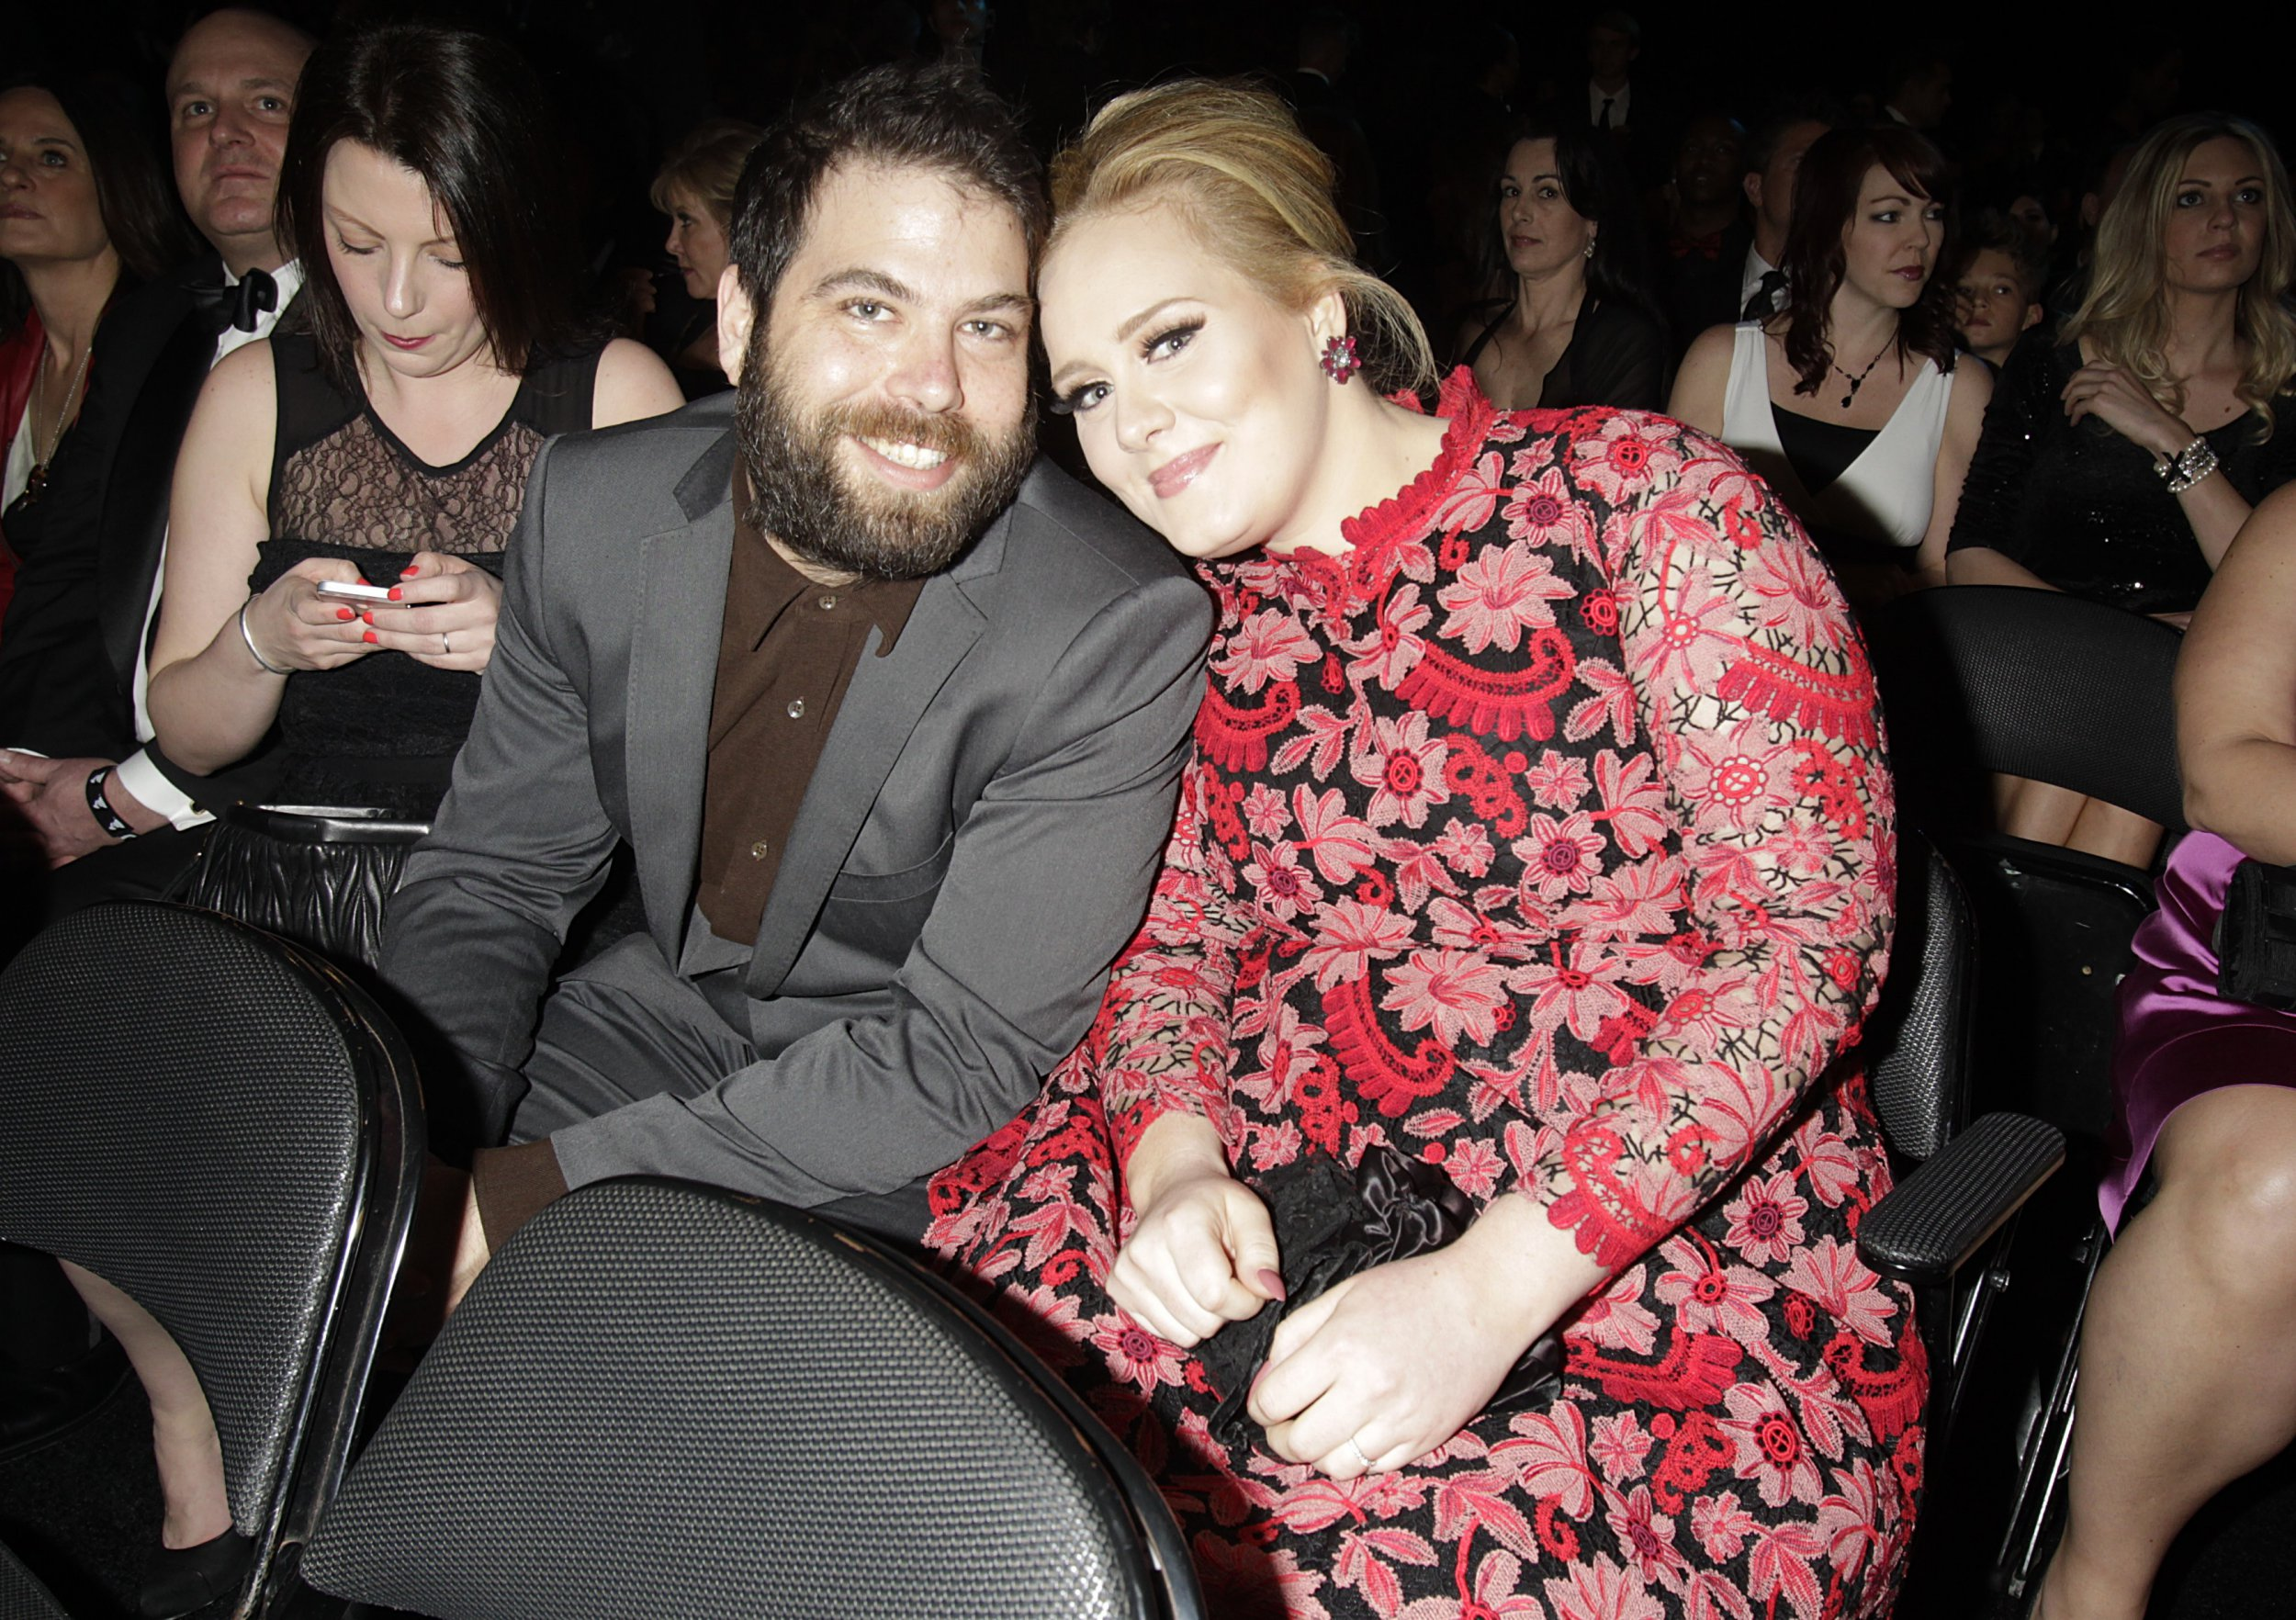 Adele 'gifted former husband Simon Konecki Los Angeles home' months before announcing split